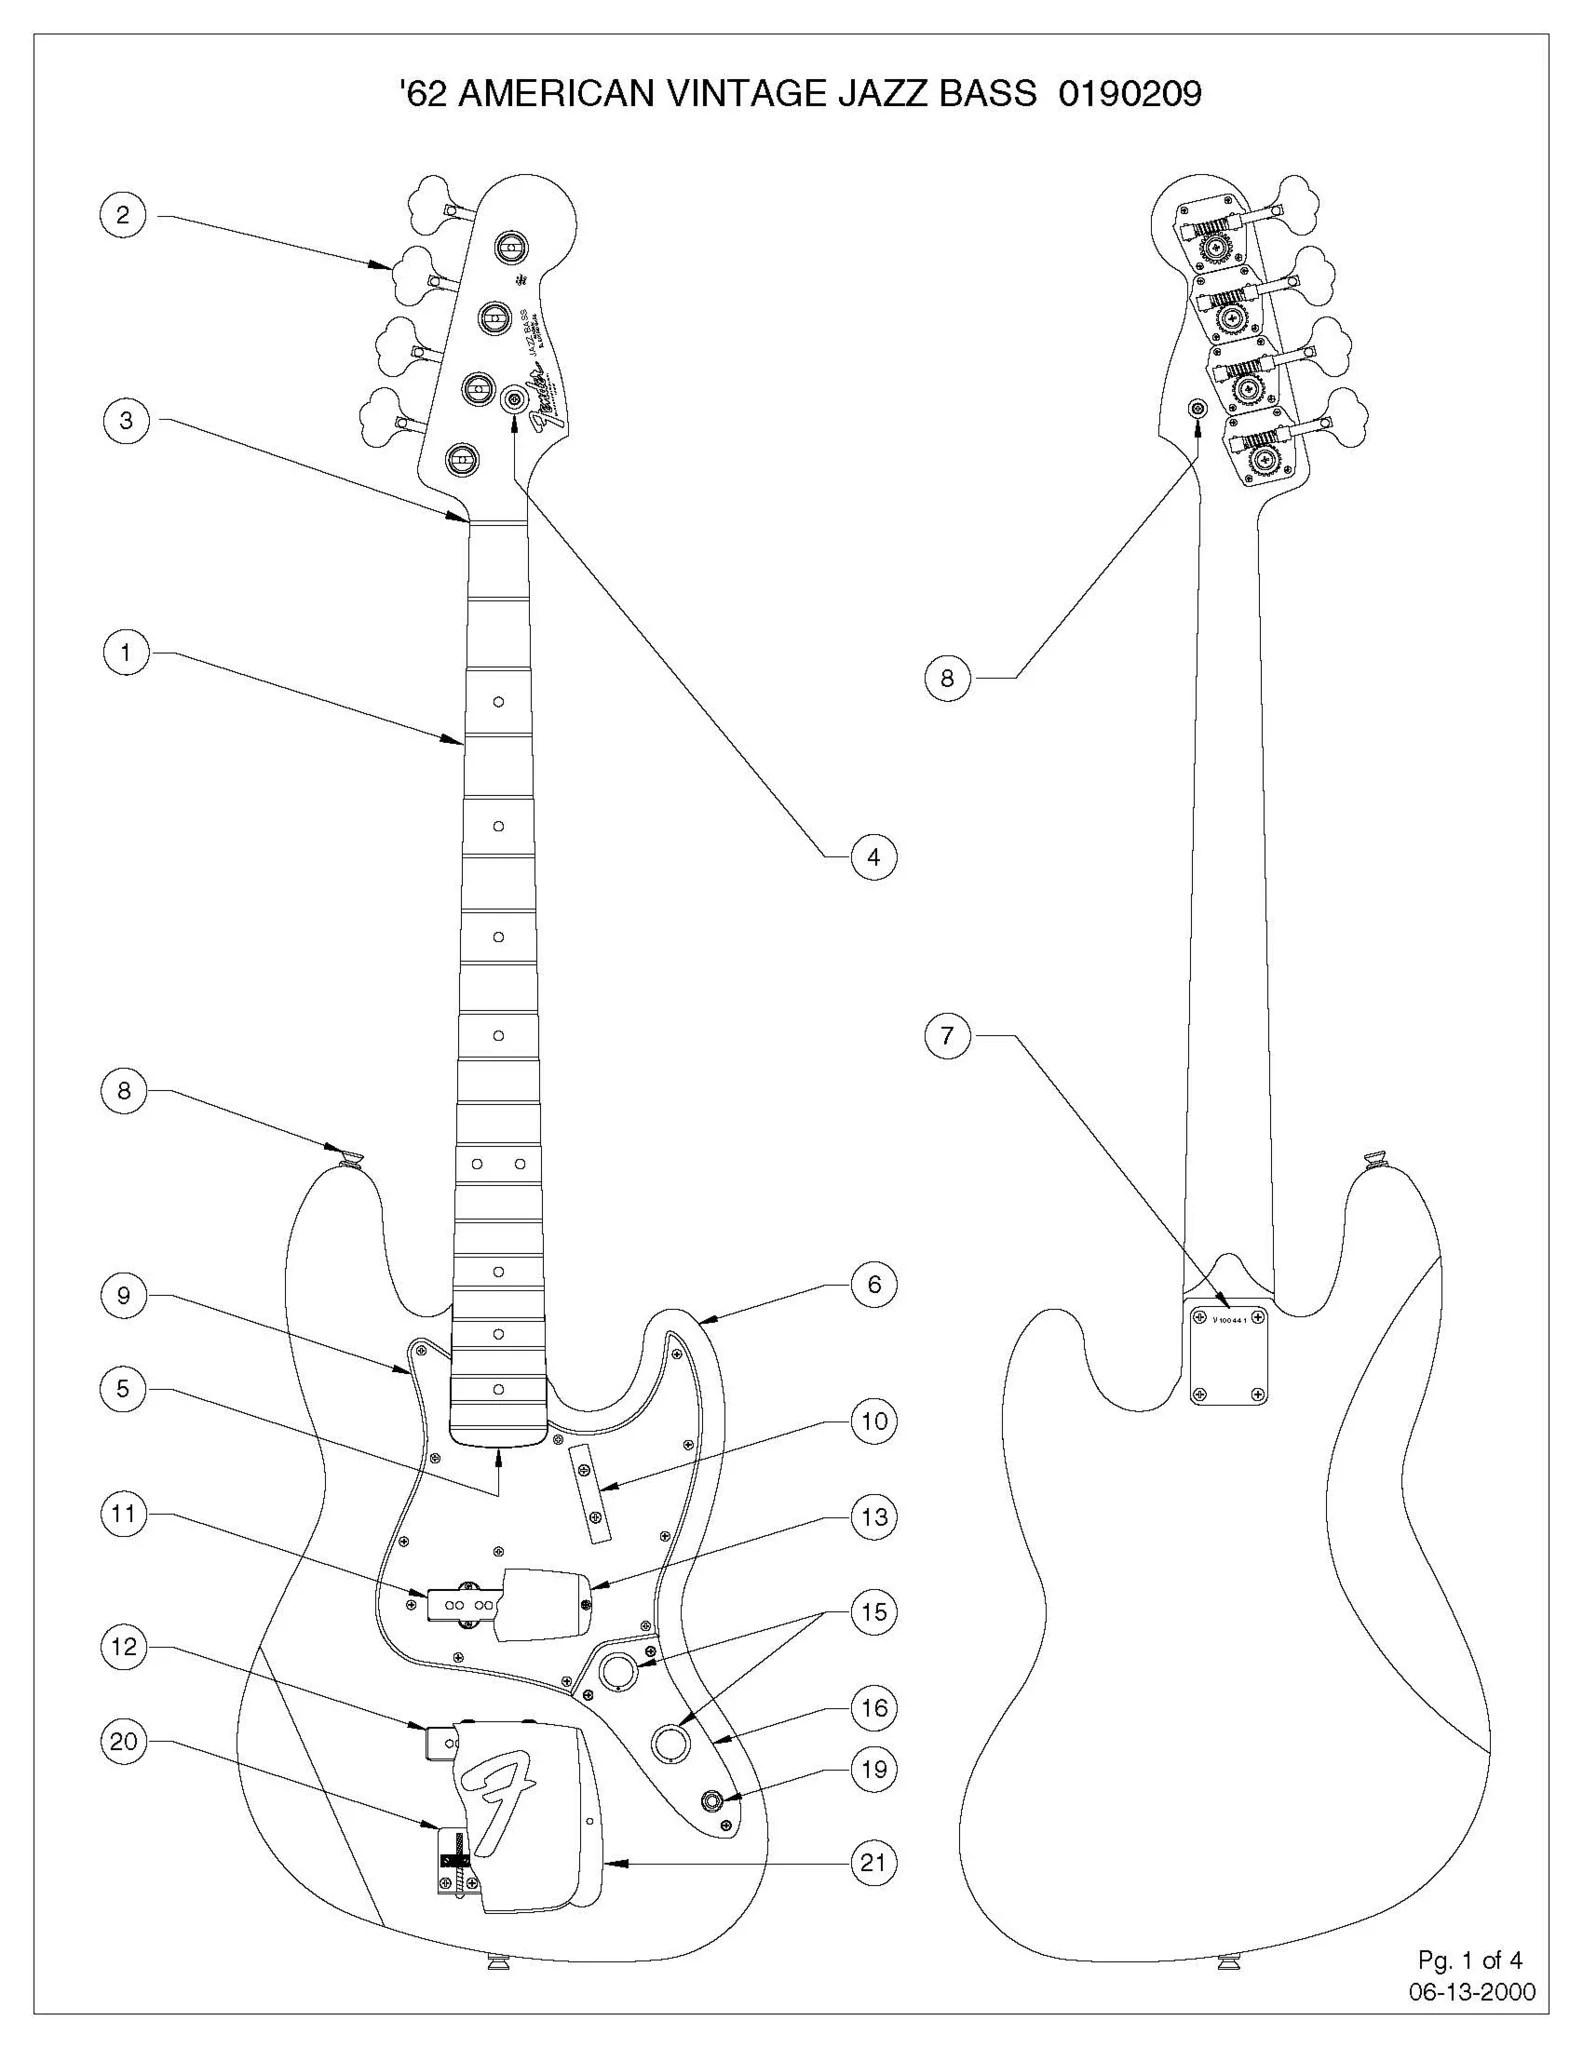 hight resolution of 62 jazz bass wiring diagram diagrams jazz bass concentric u2013 sigler music design